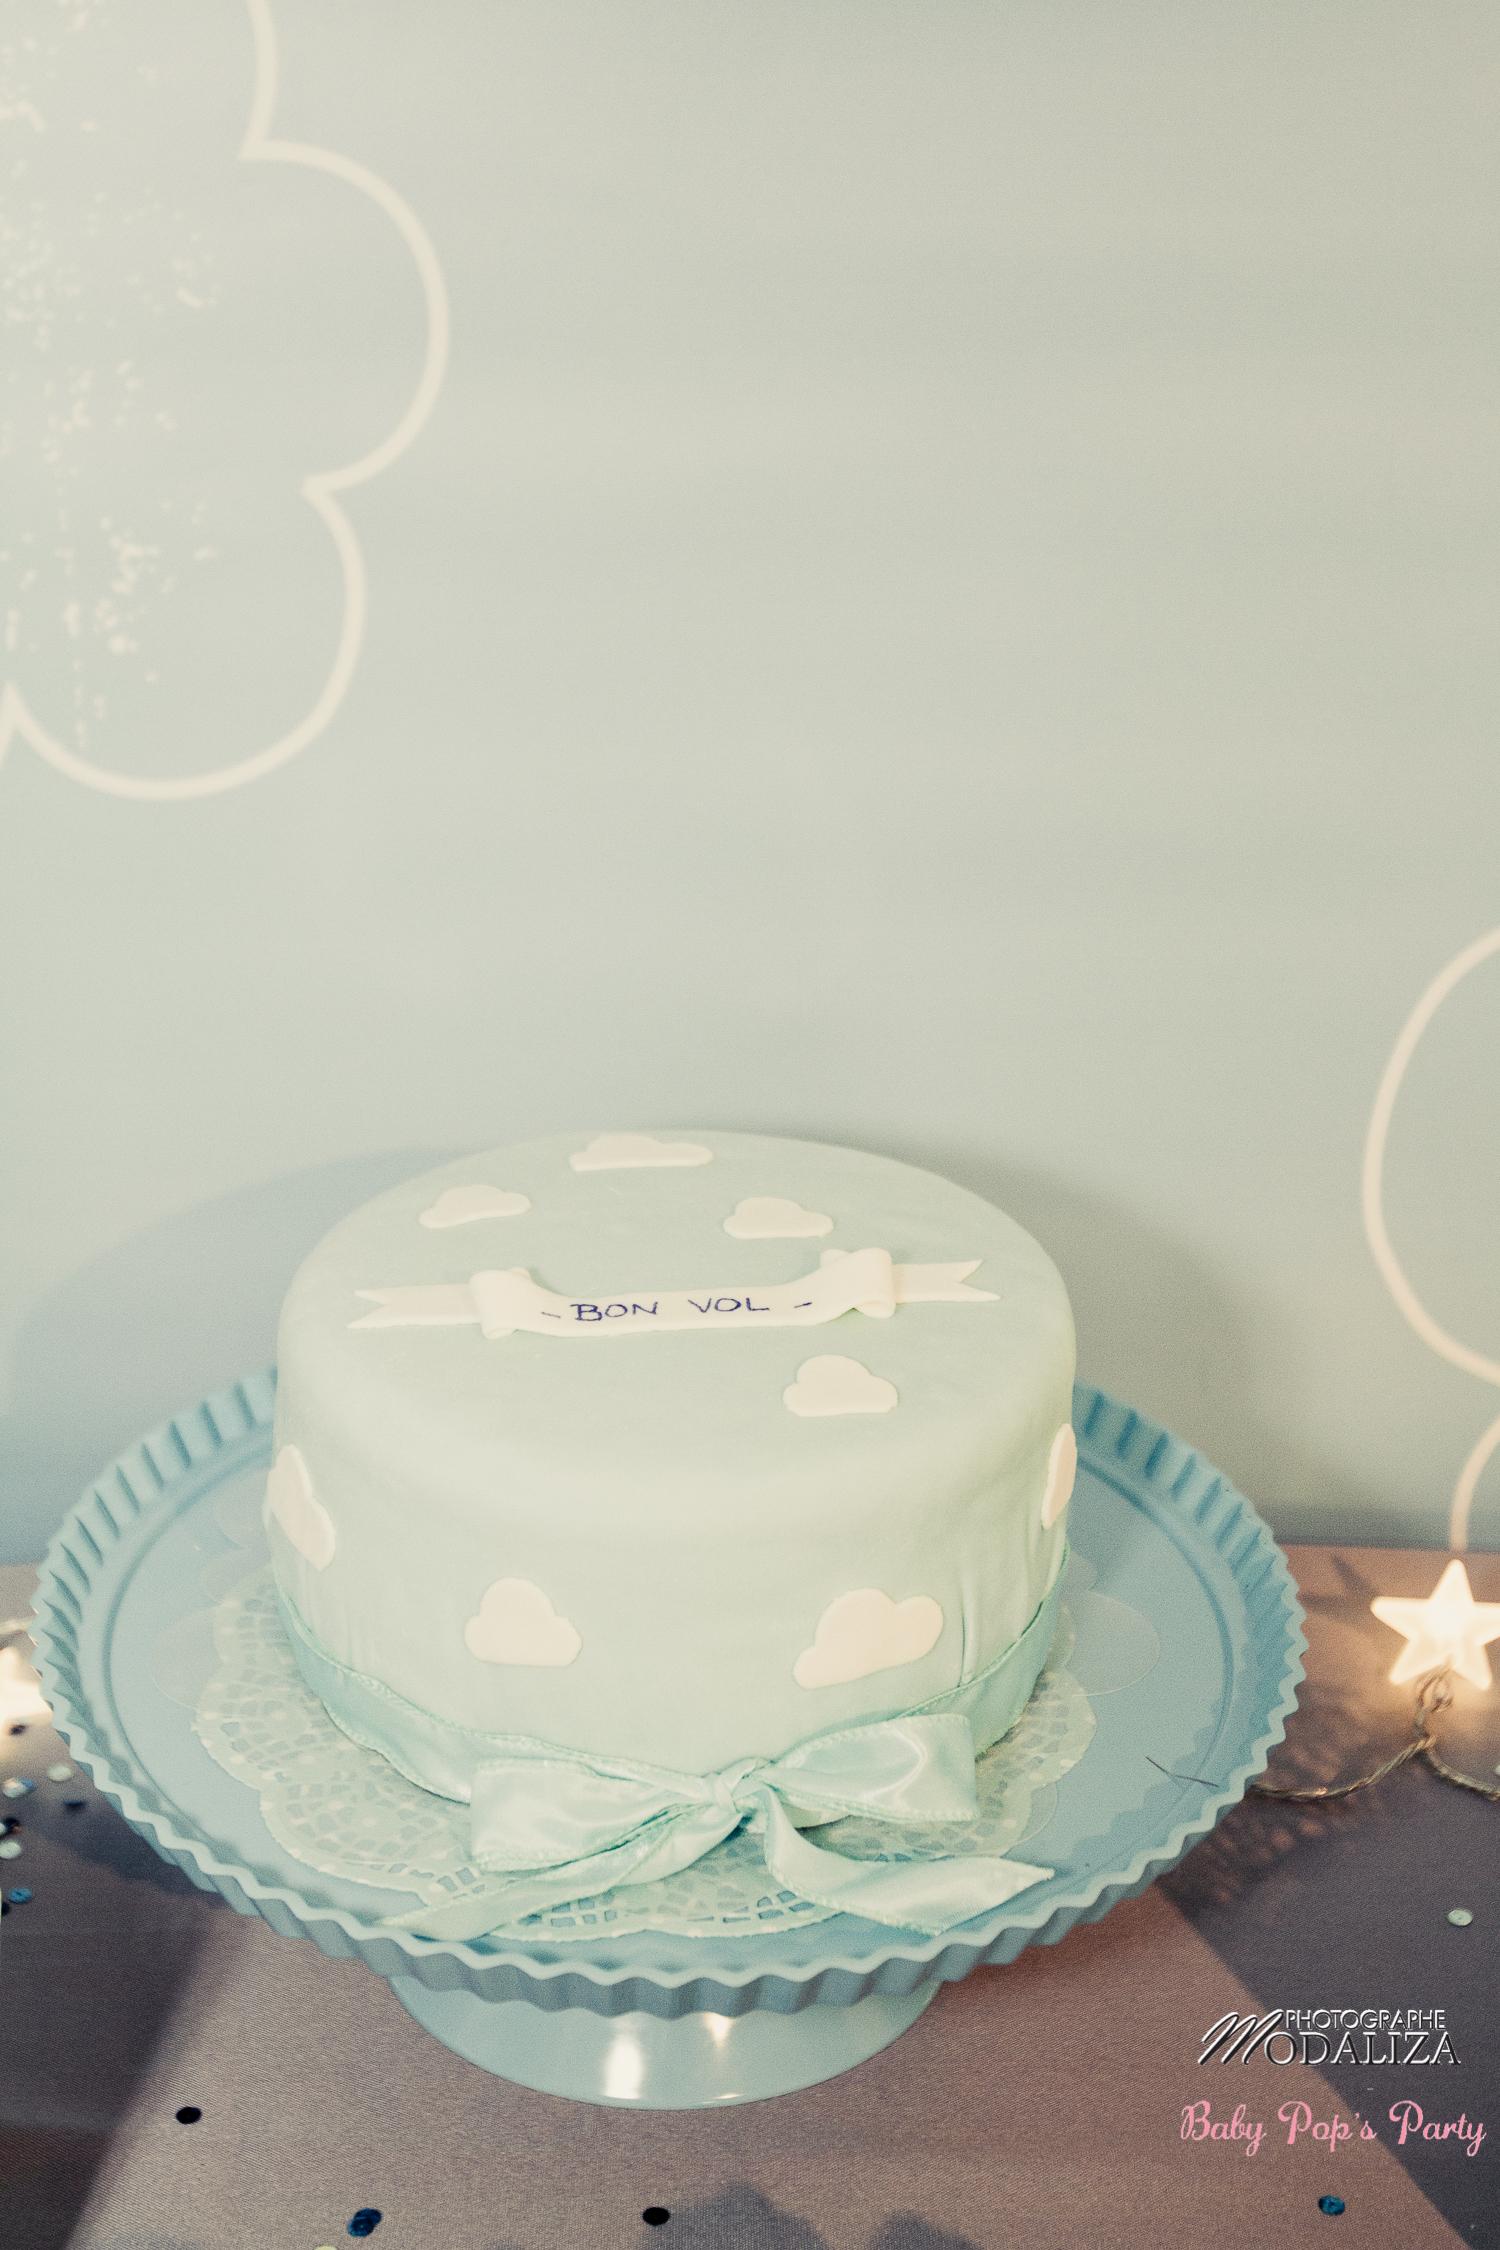 Babyshower bleu nuages baby pop's party by modaliza photographe-6888